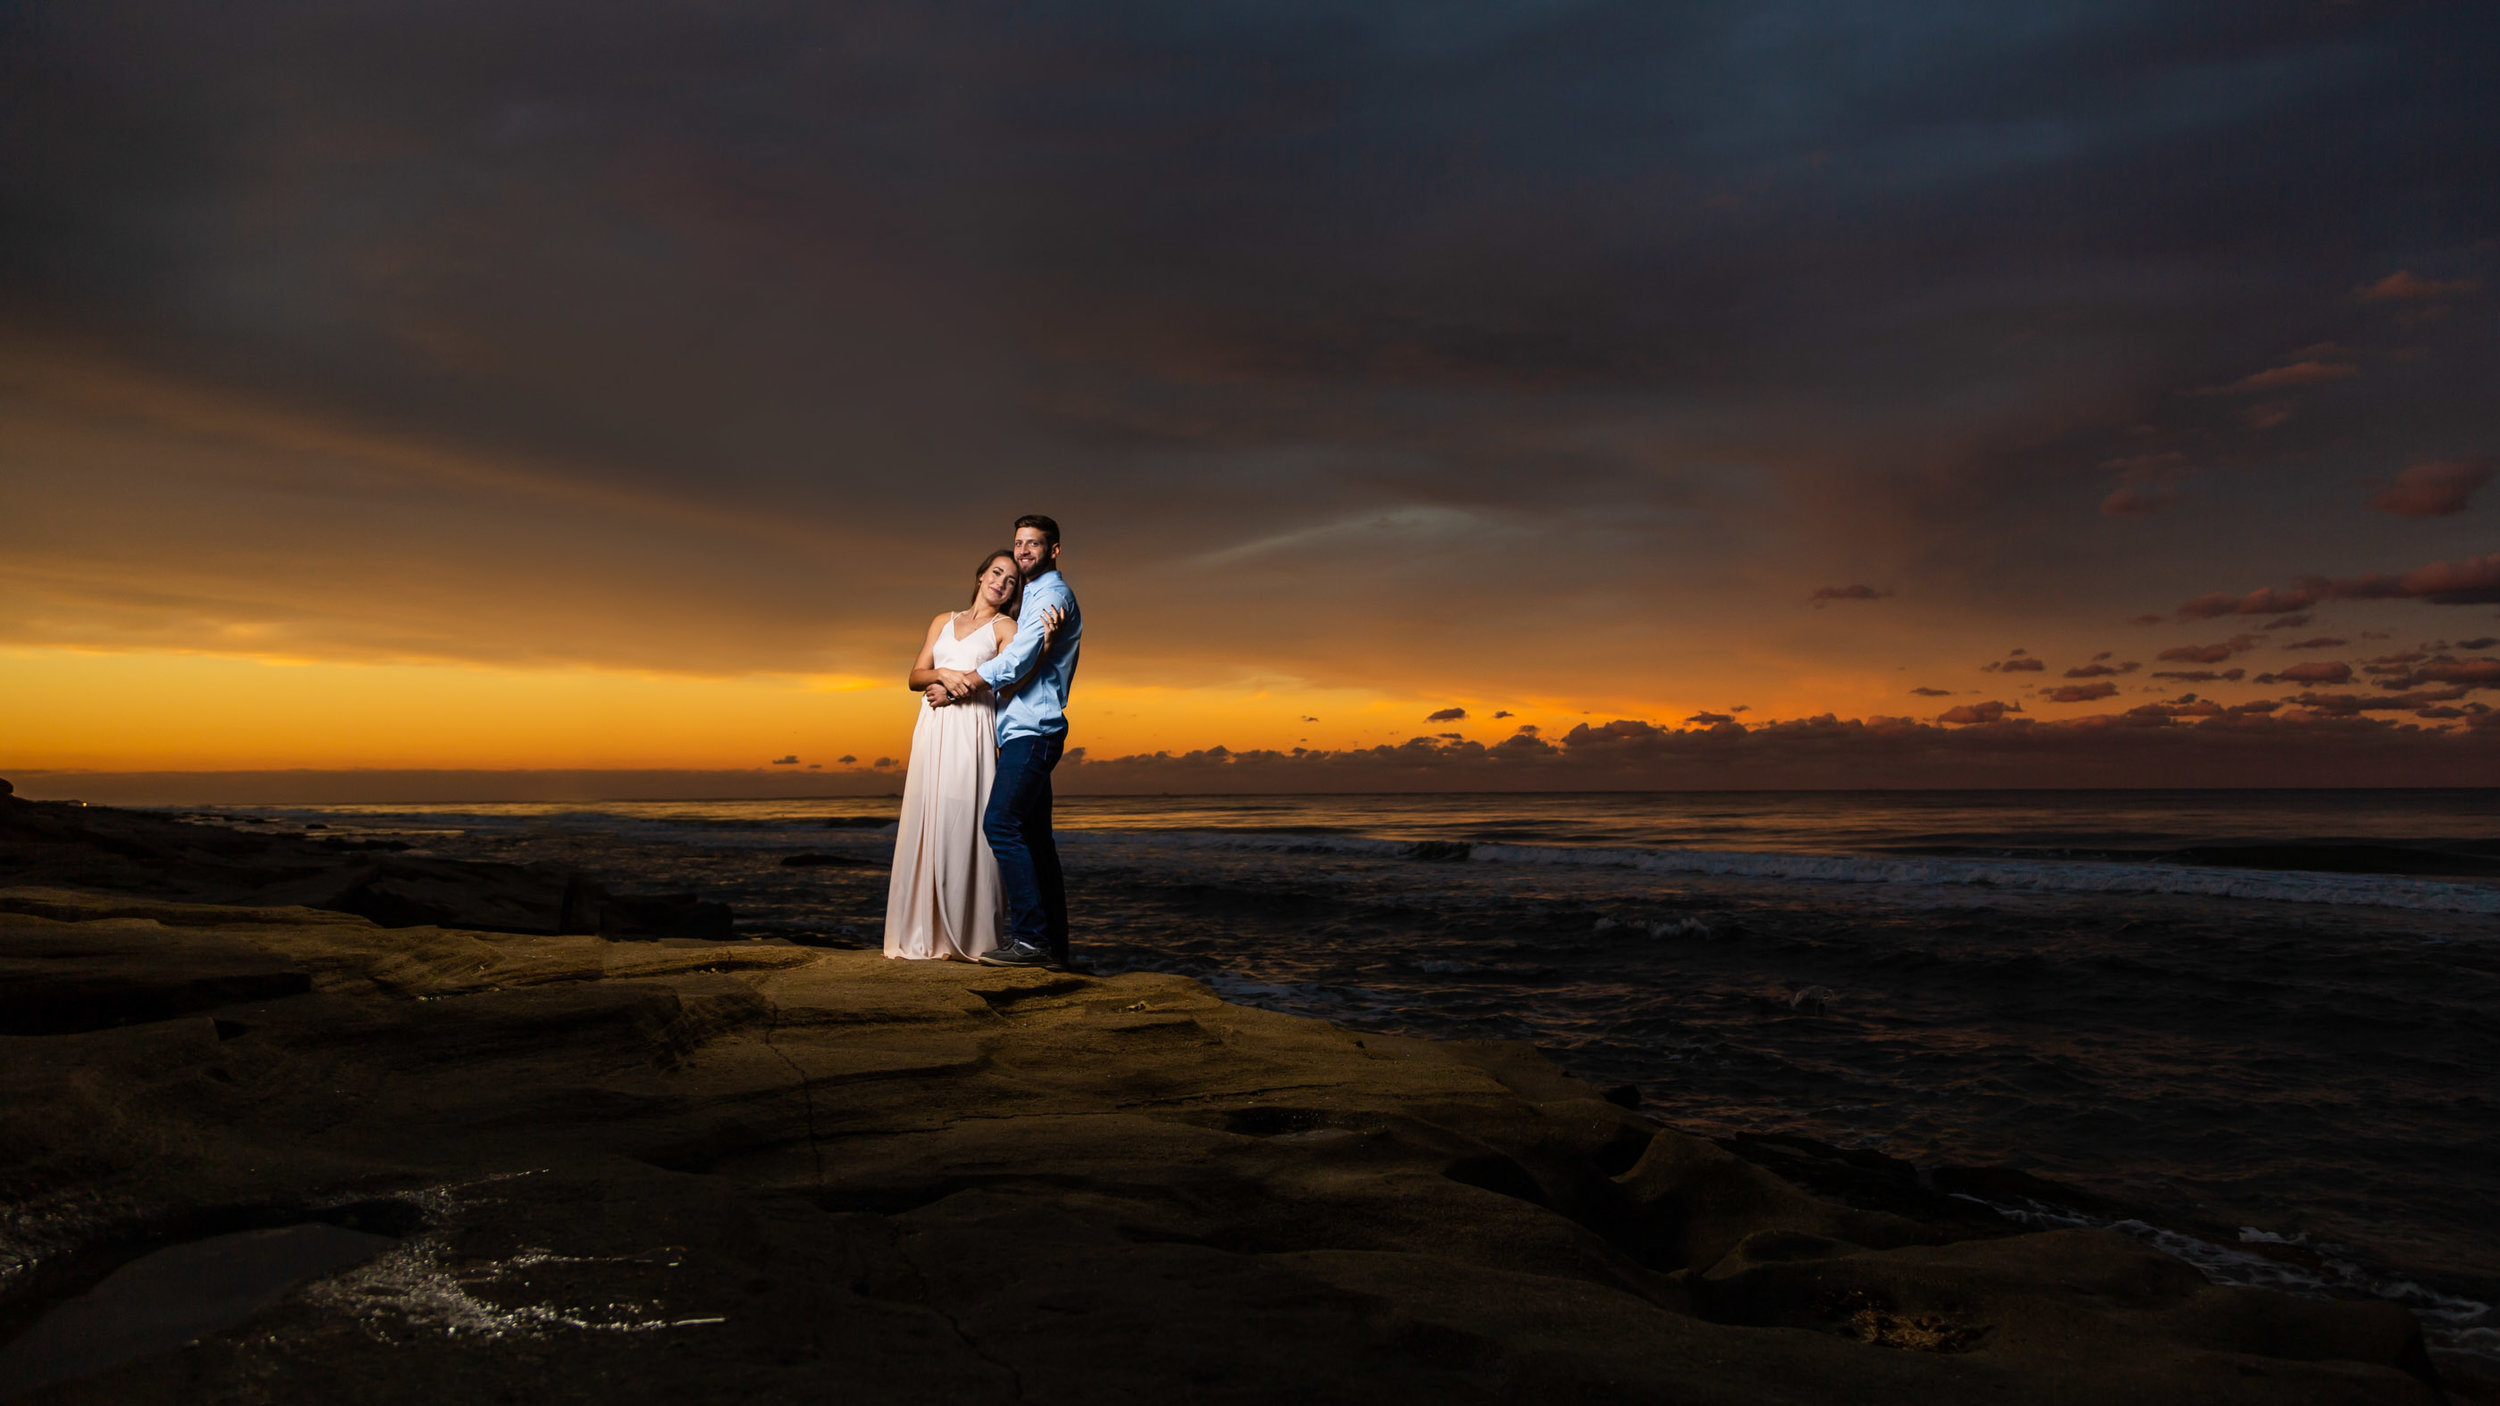 adam-szarmack-jacksonville-wedding-photographer-palm-coast-washing-oaks-garden-state-park-engagement-57.jpg